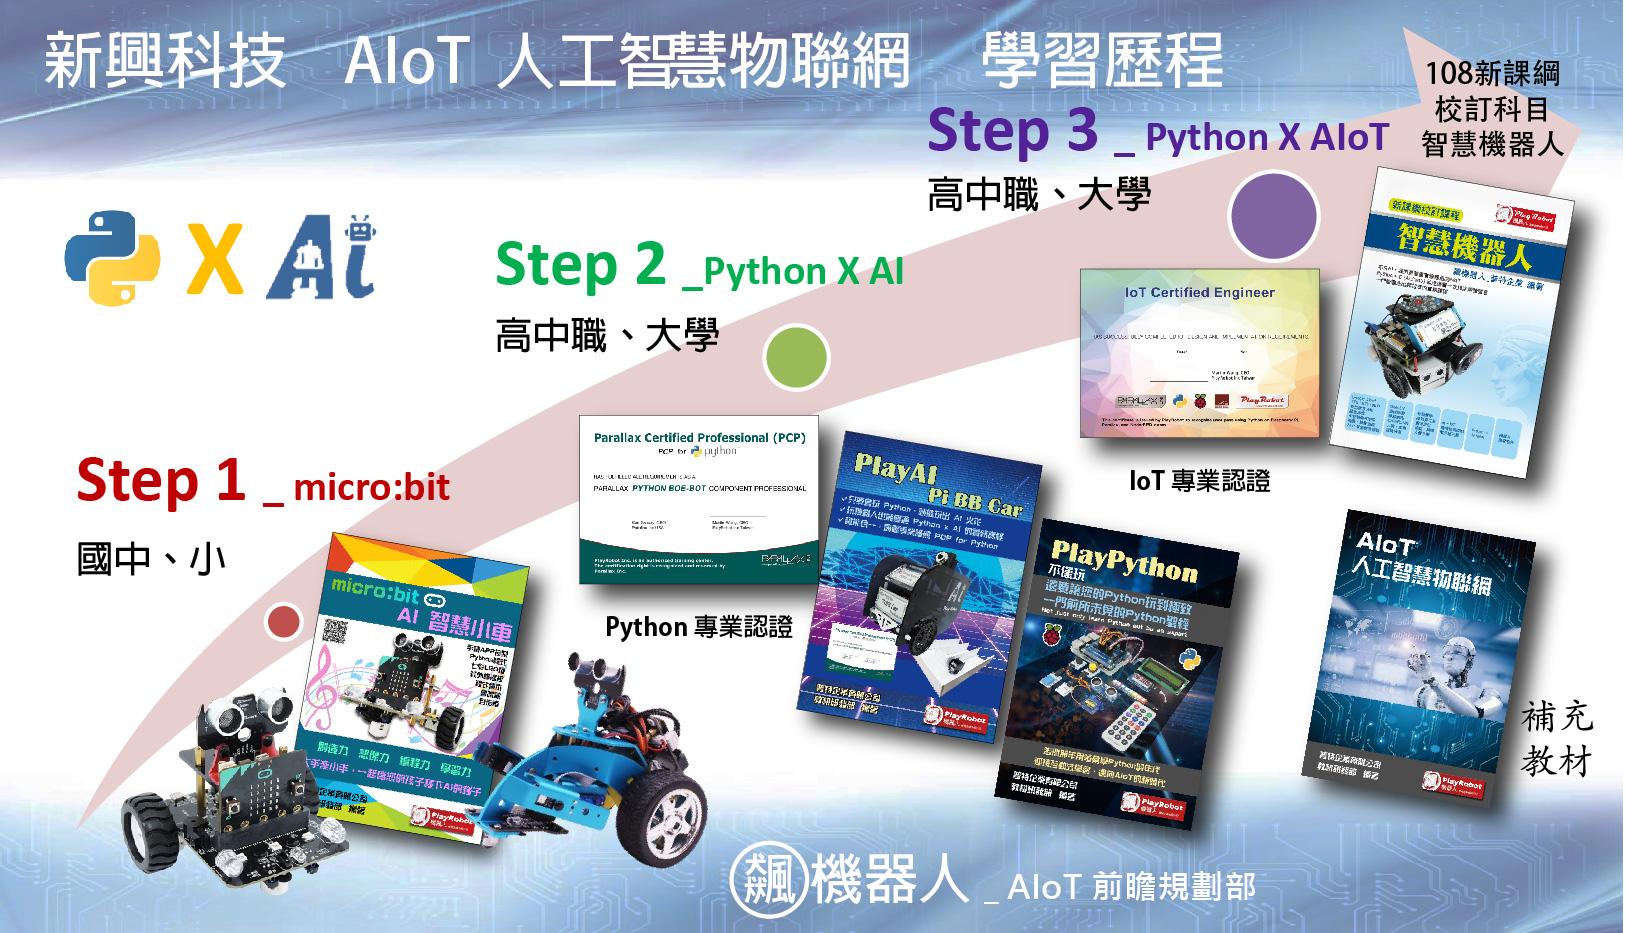 AIoT學習歷程